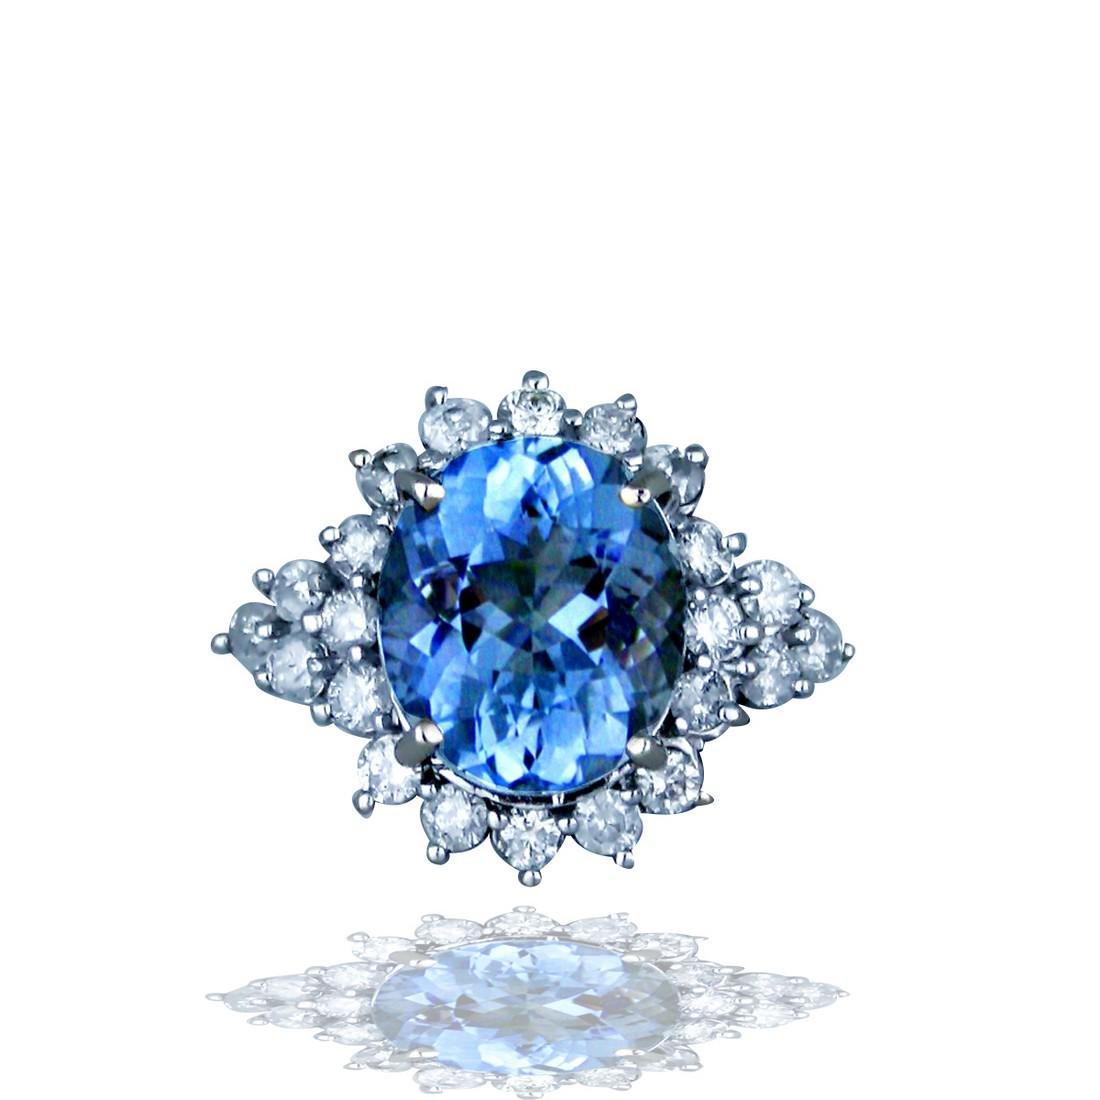 Oval Aquamarine 7.80 carat, Halo Diamond, 1.32 Carats